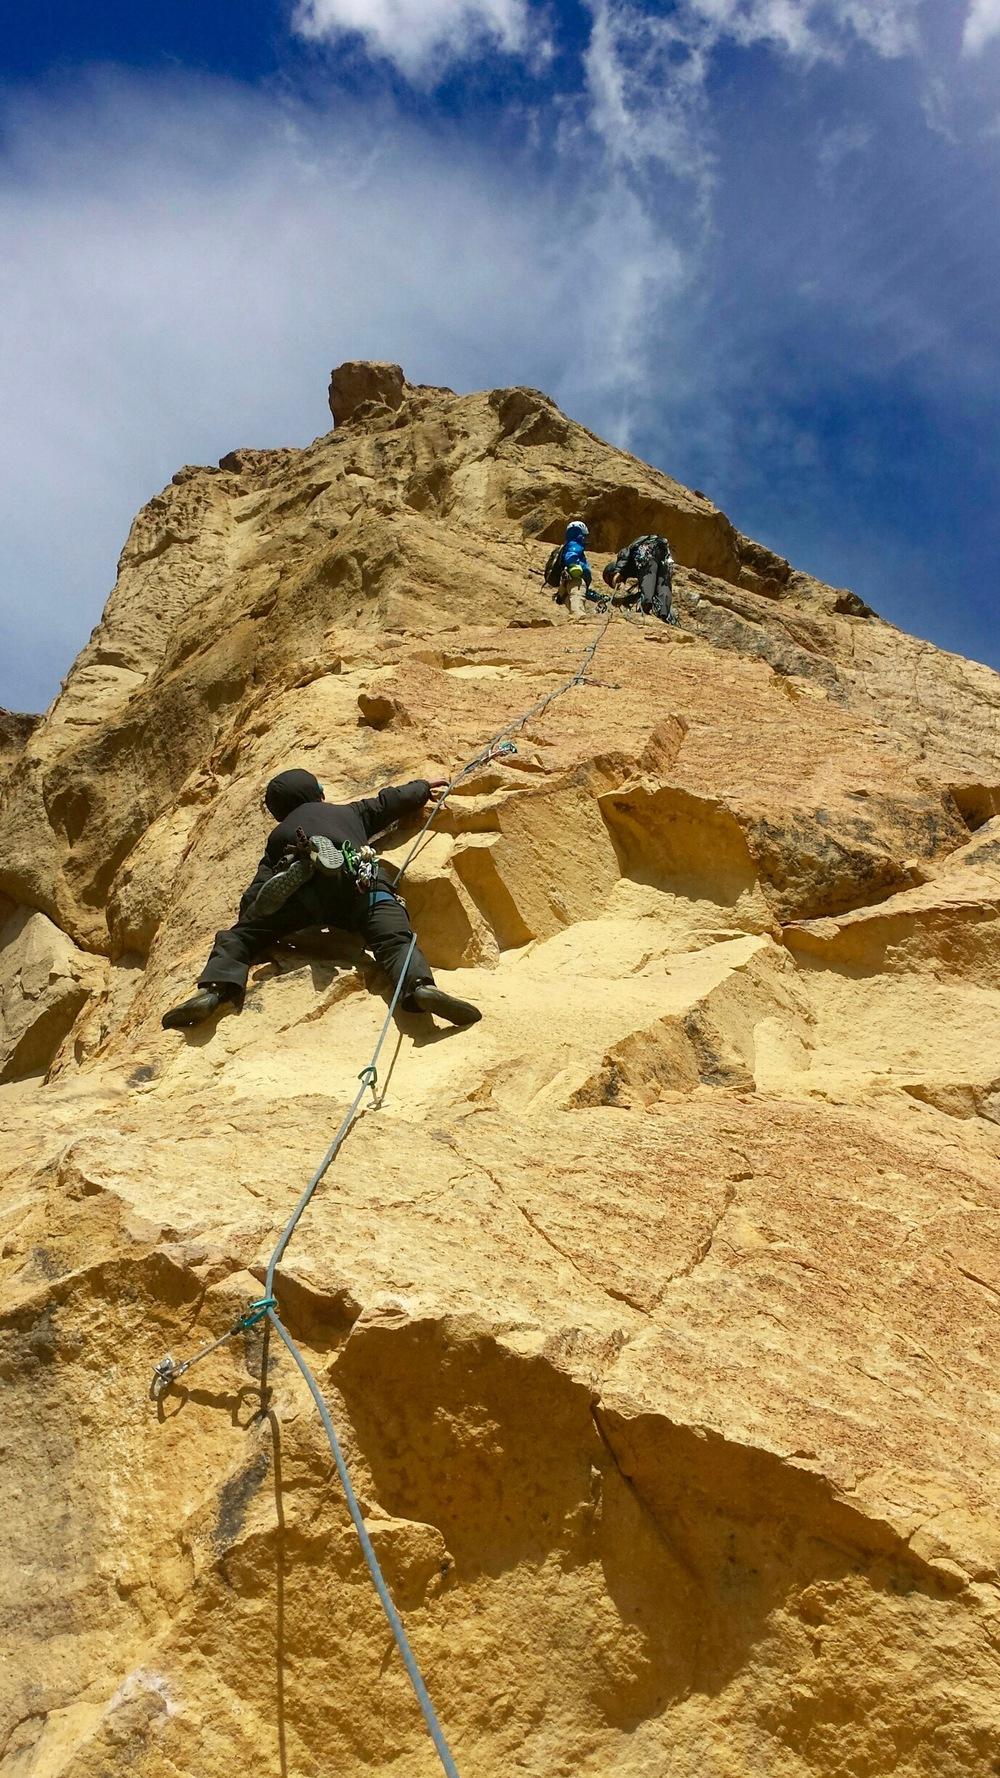 San Francisco Traditional Rock Climbing